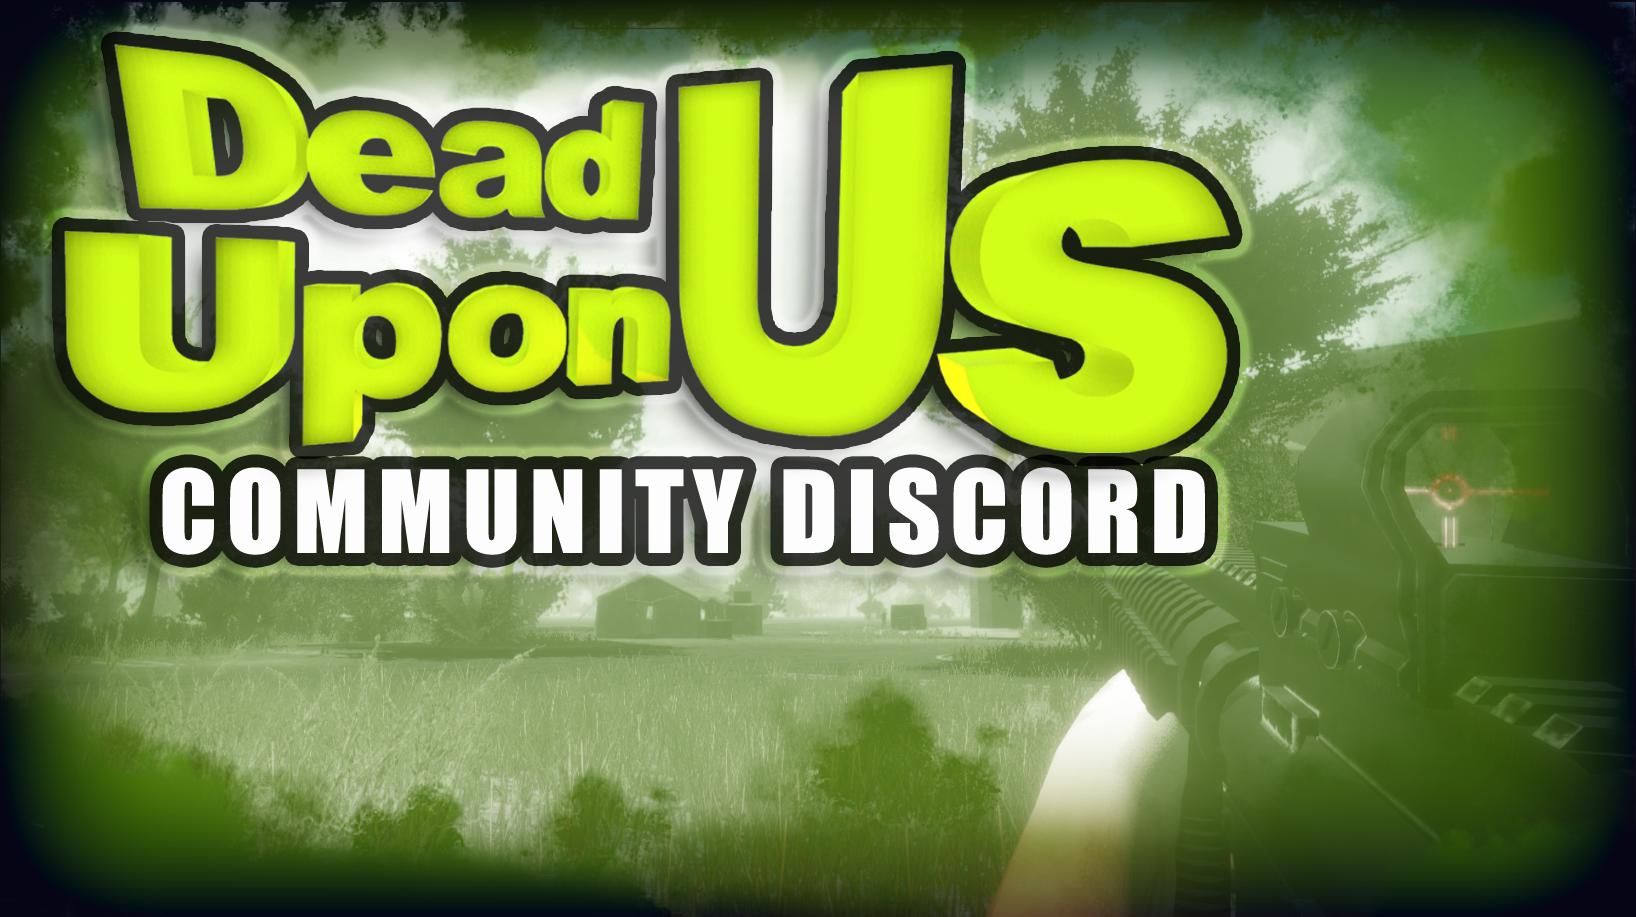 CommunityDiscord